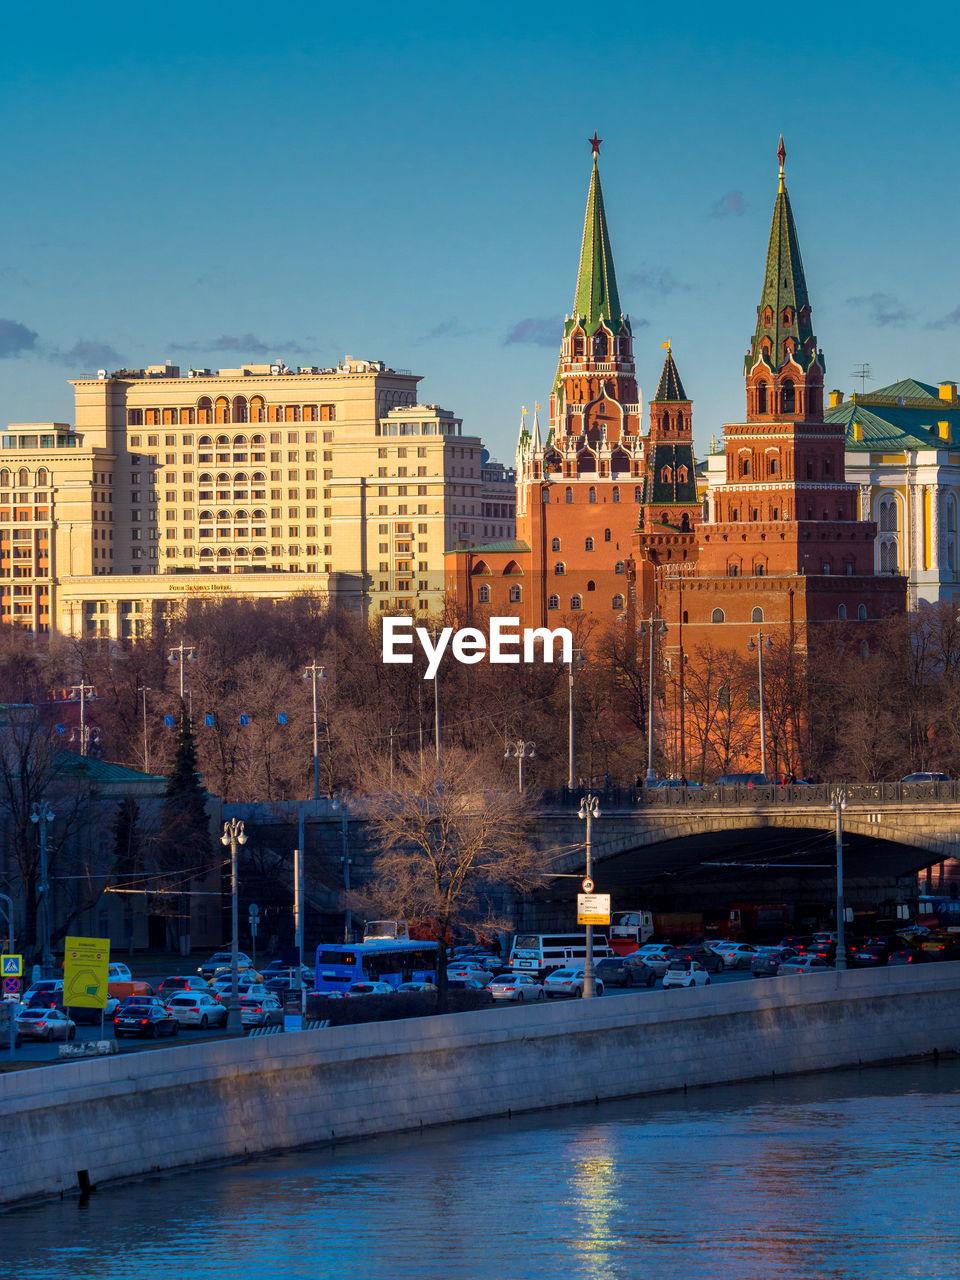 River against buildings in city